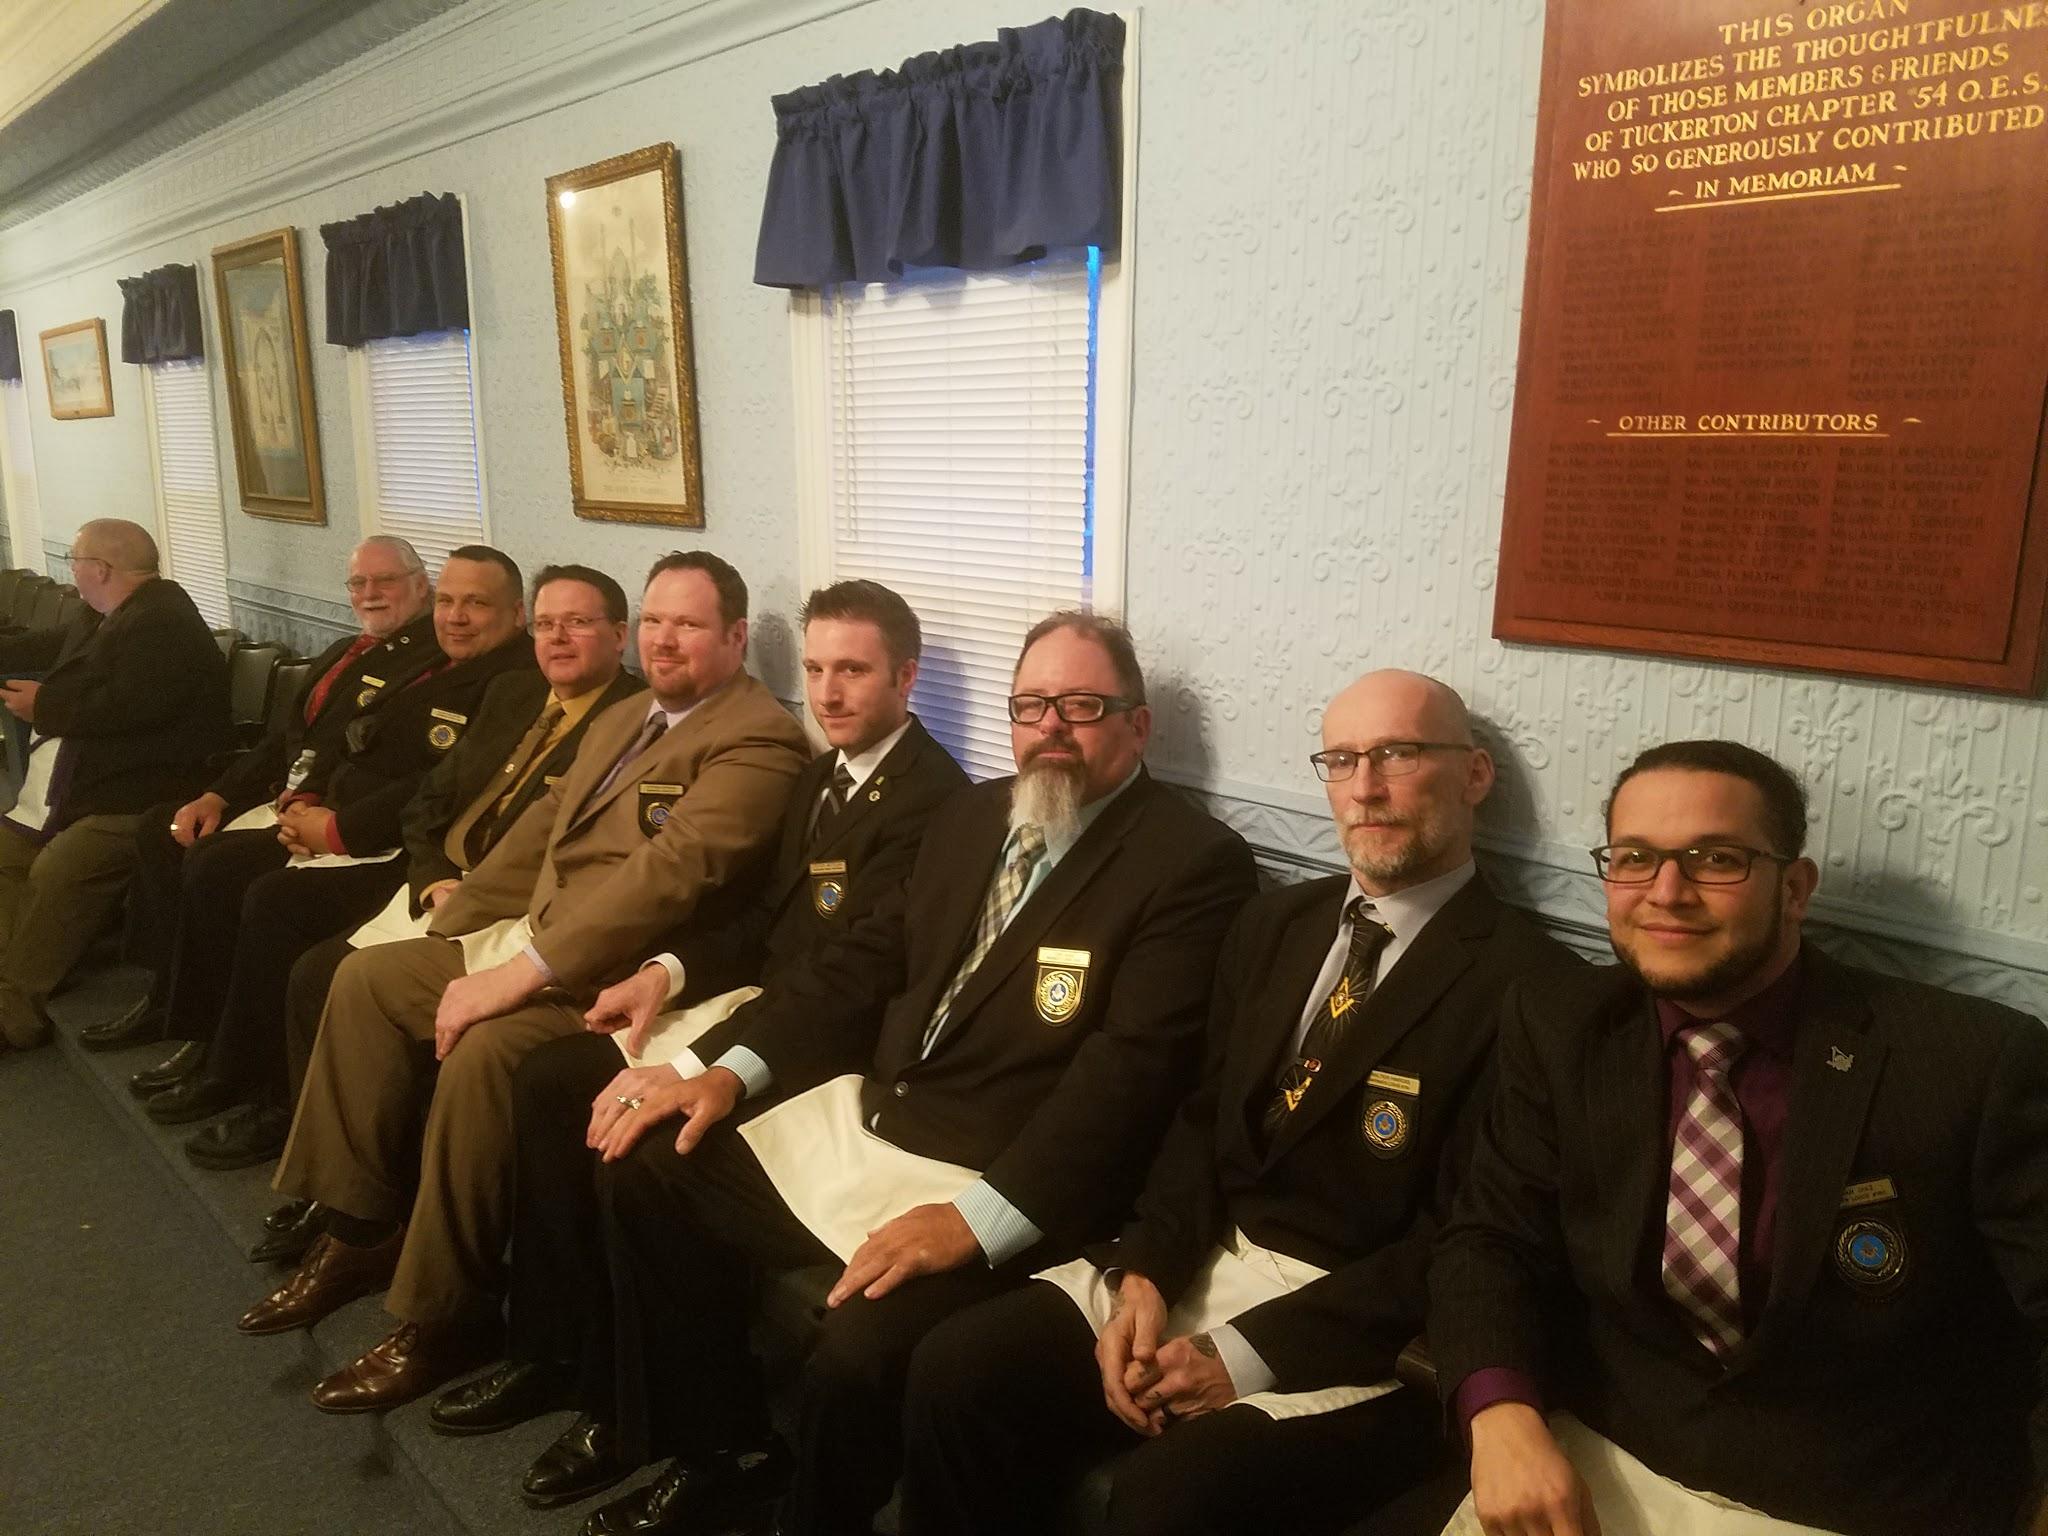 591a93bc0 Steve M. Tagged as: Brearley Award, Freemasonry, Mariners Lodge, Tuckerton  Lodge Comments Off